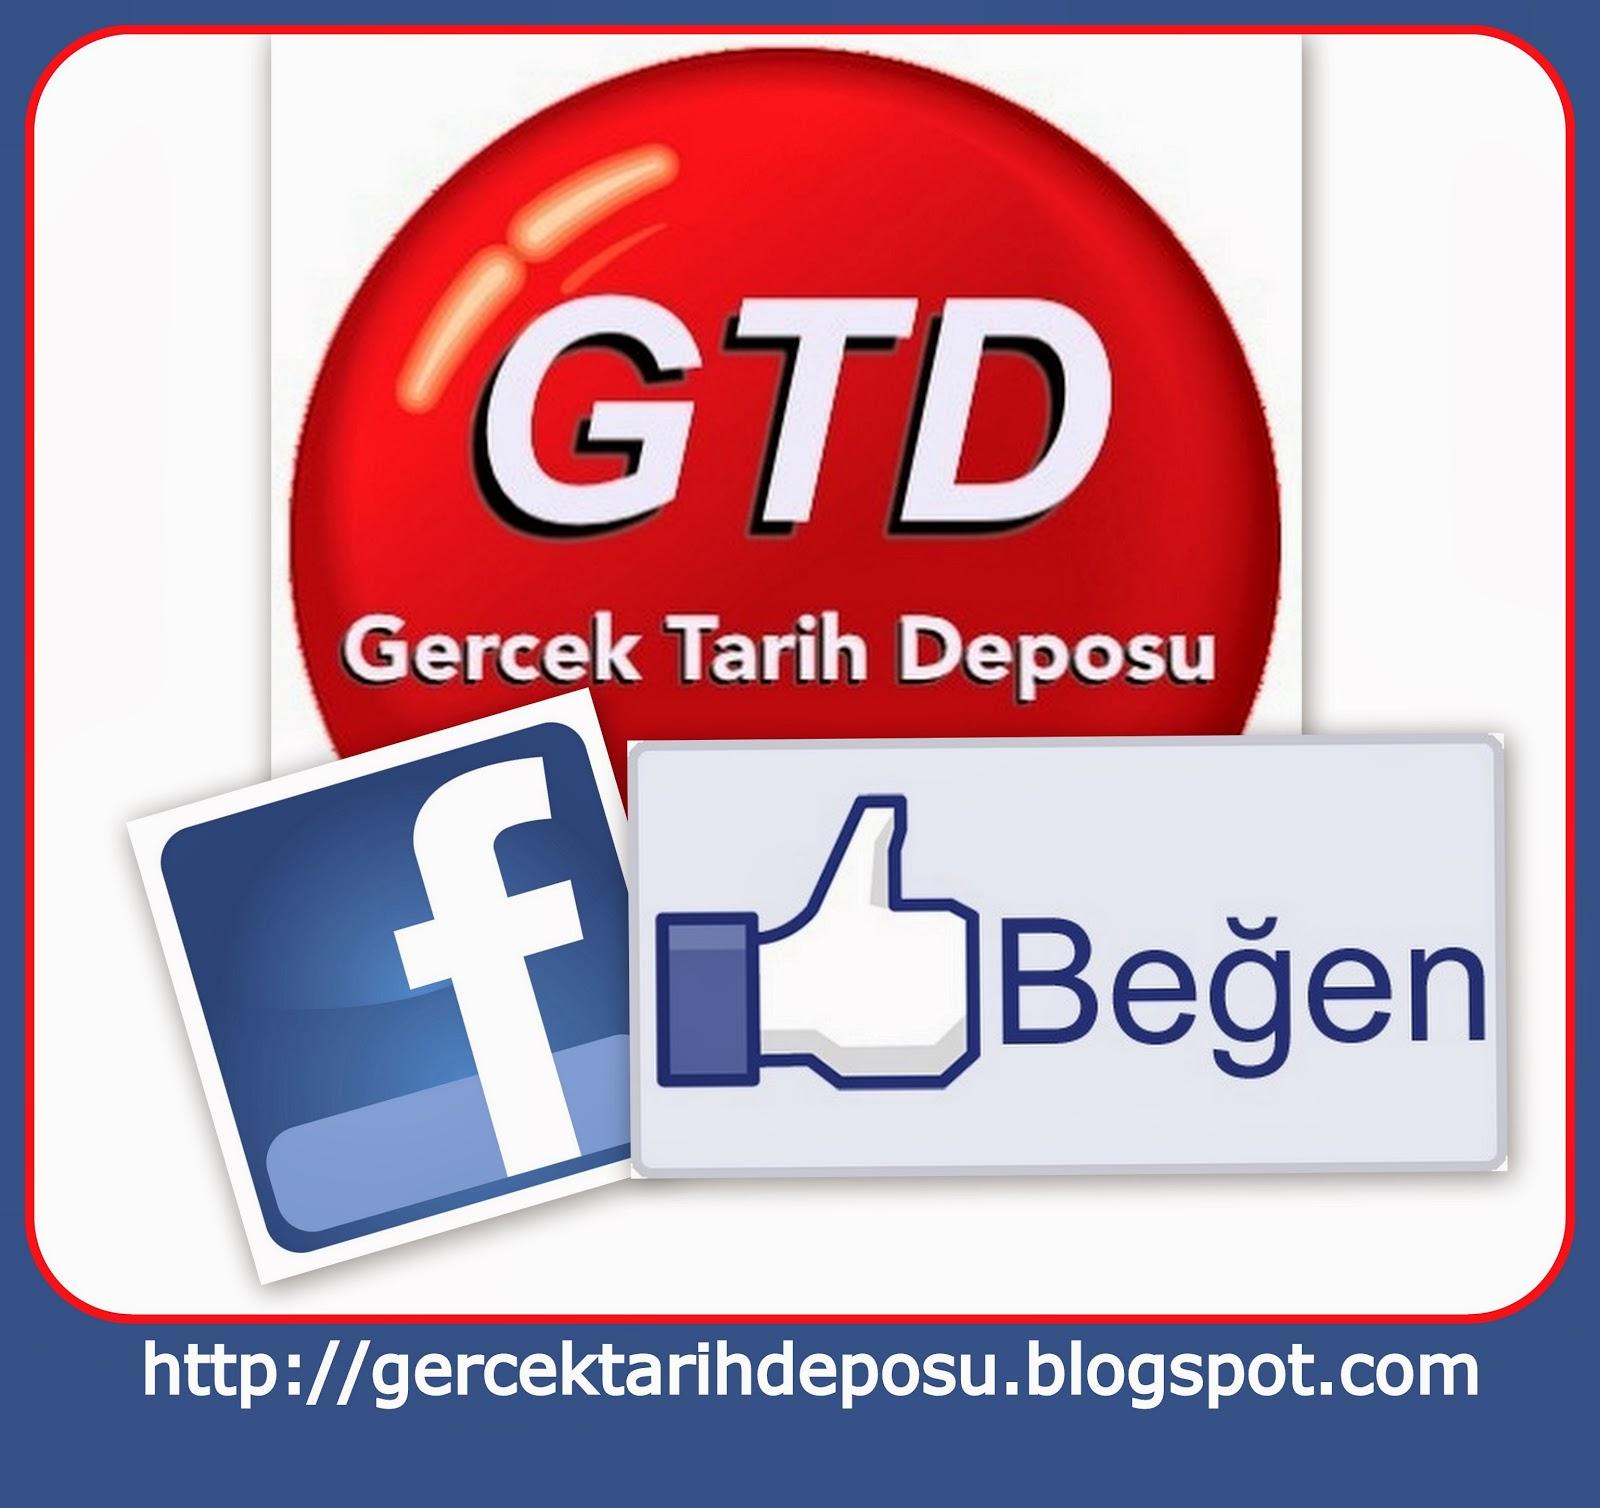 https://www.facebook.com/pages/Gercek-Tarih-Deposu/536344873116611?ref=hl